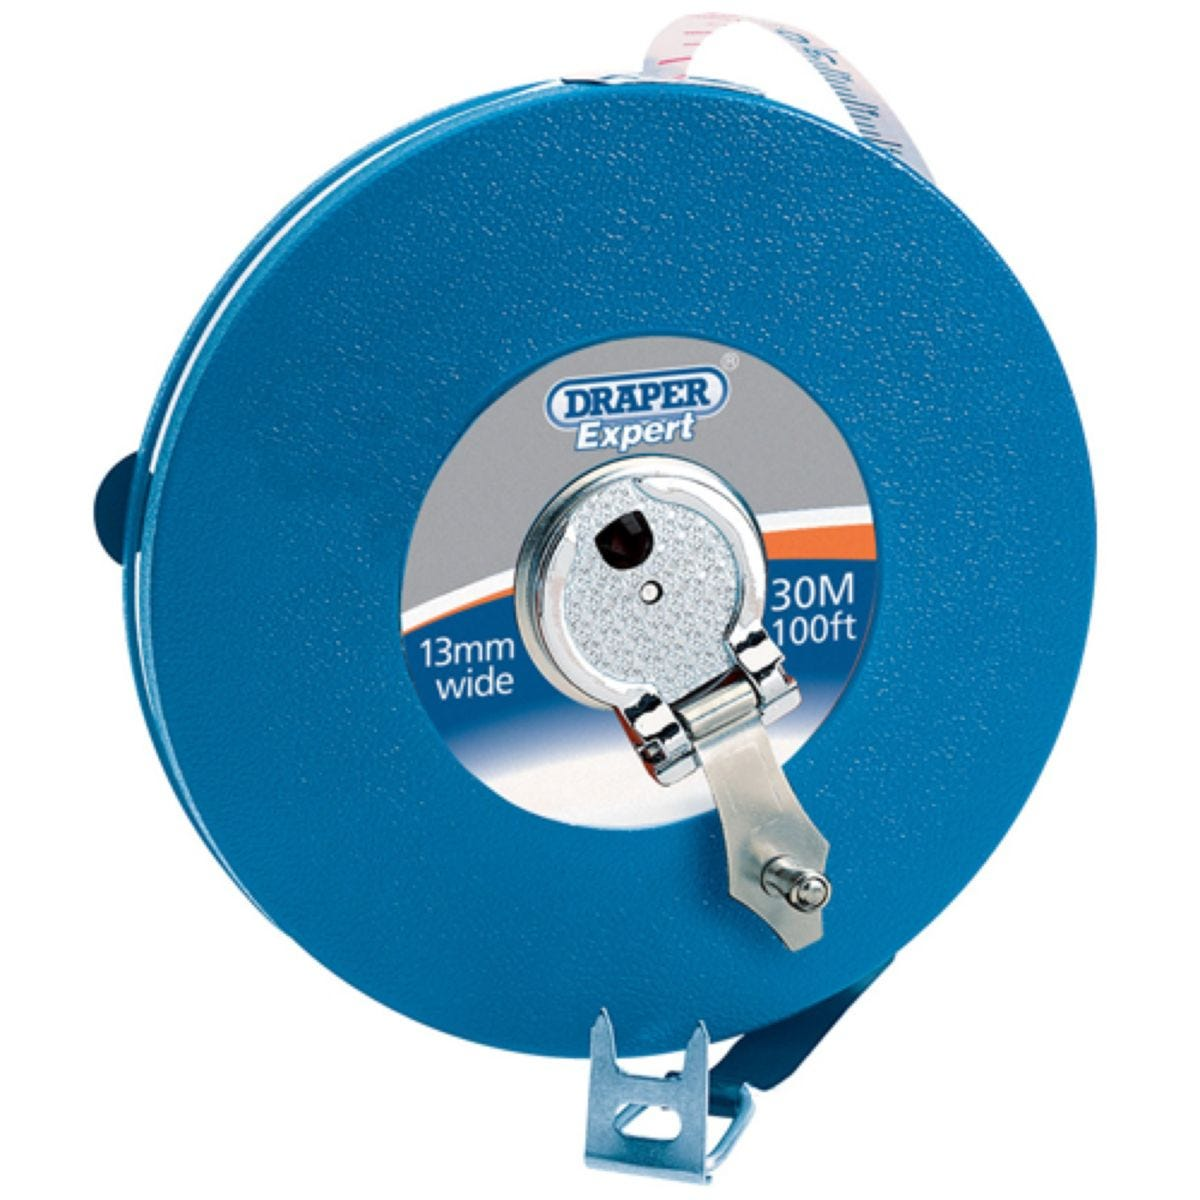 Draper 30m Fibreglass Measuring Tape